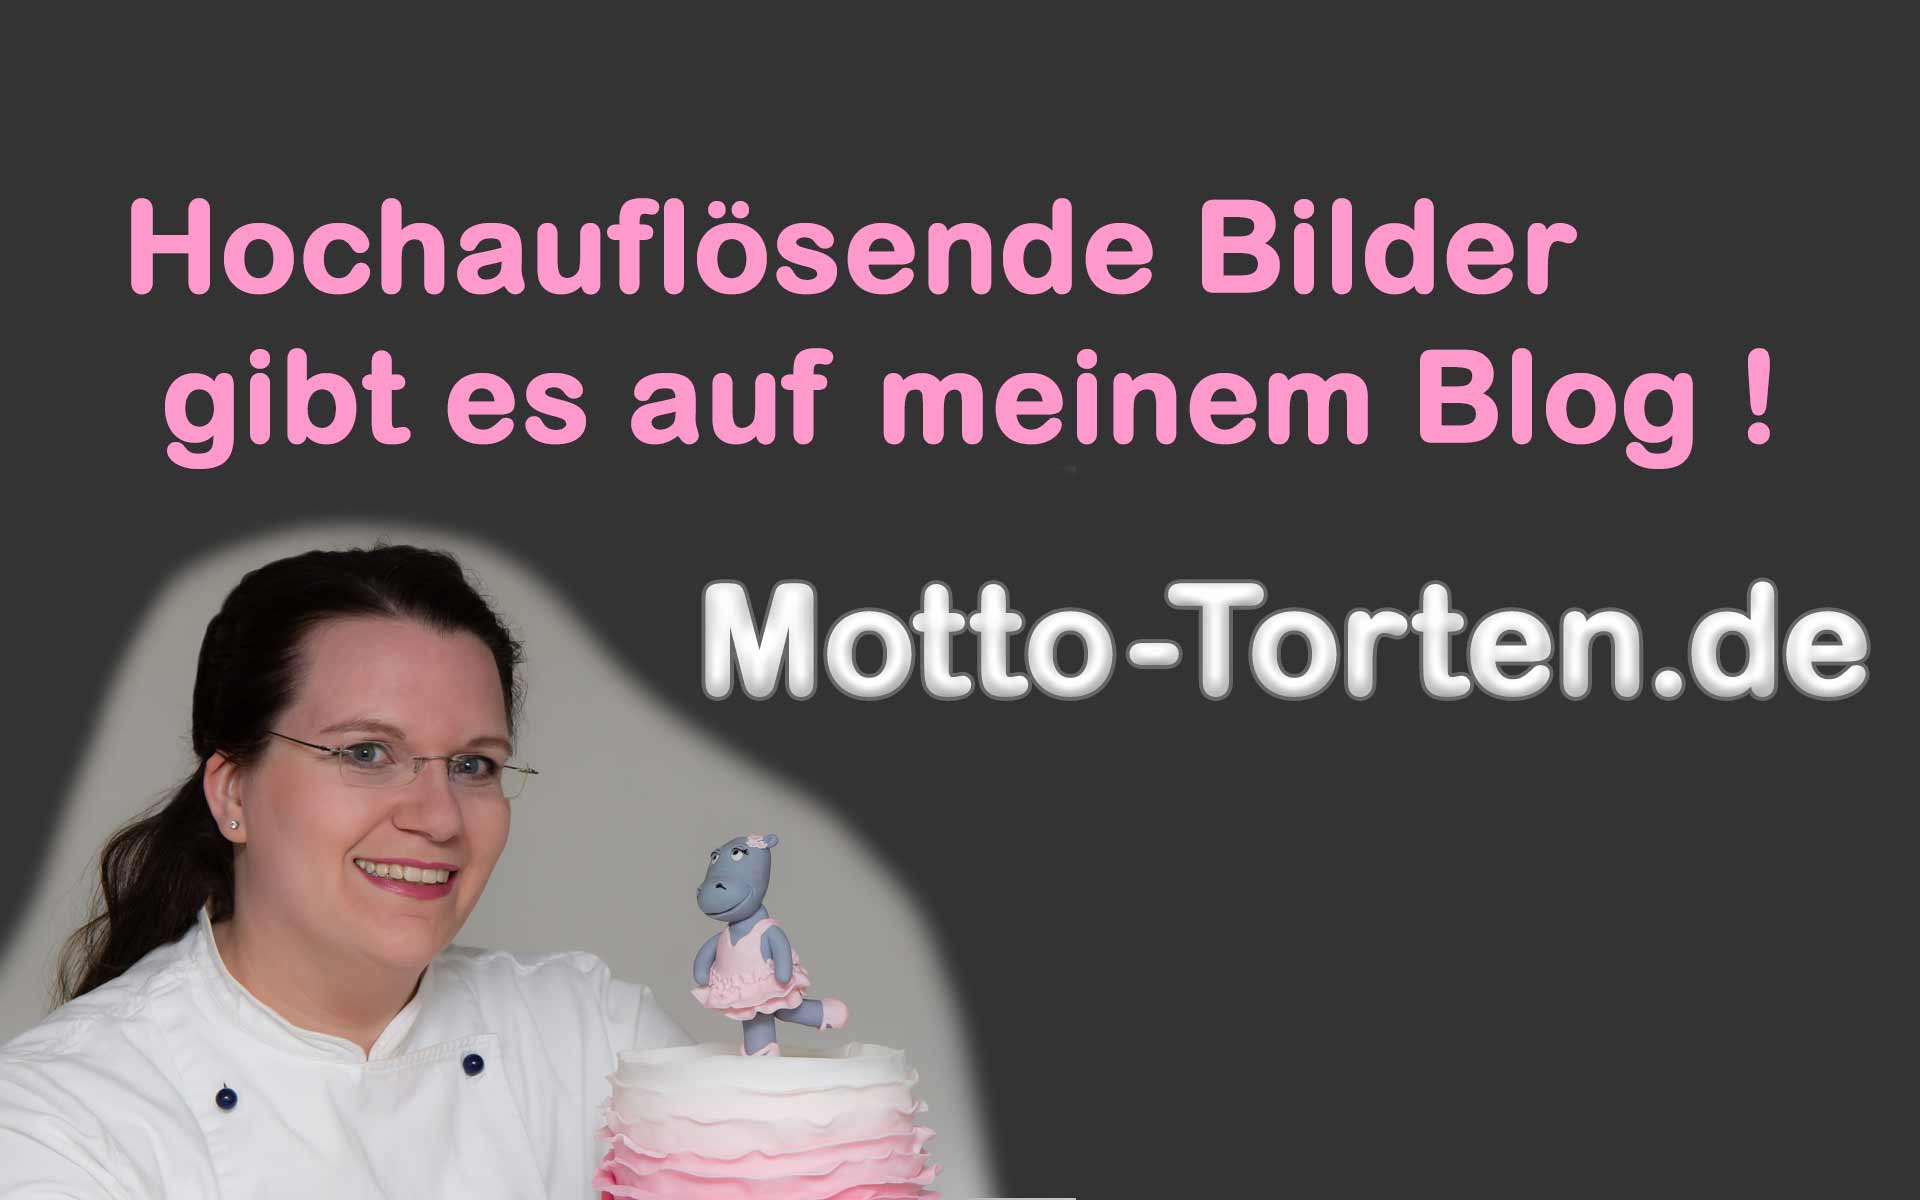 Motto-Torten.de auf dem Bake Dy